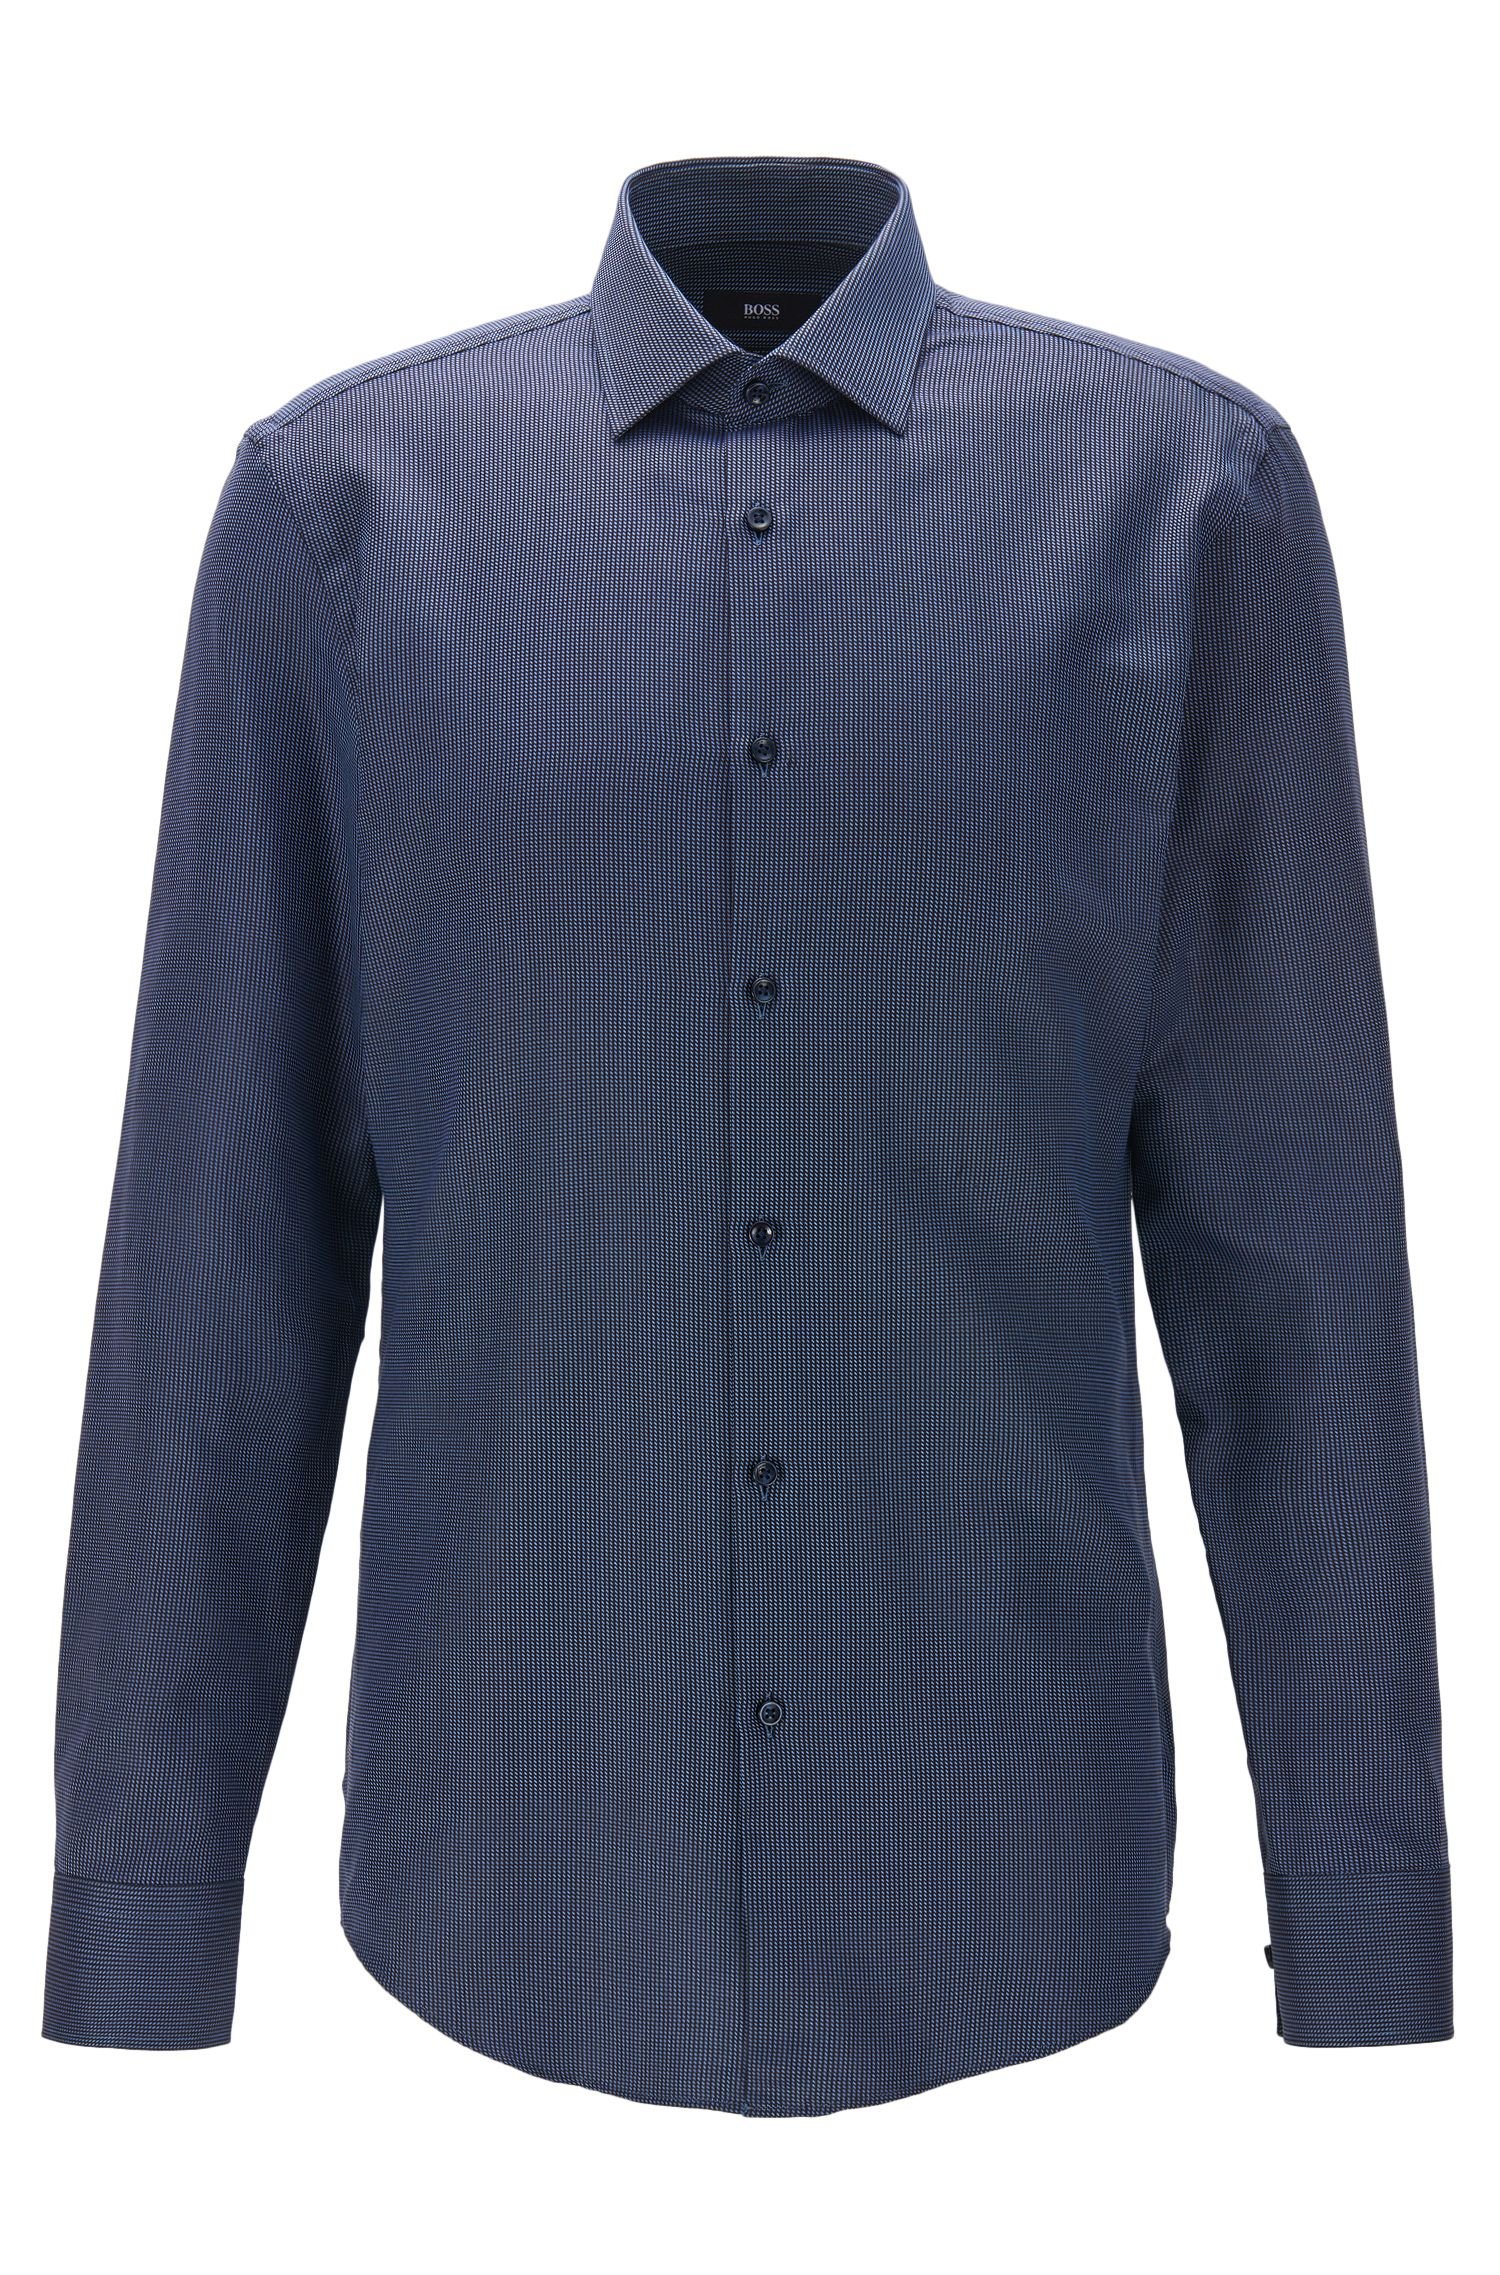 Geometric Print Cotton Dress Shirt, Slim Fit | Jenno